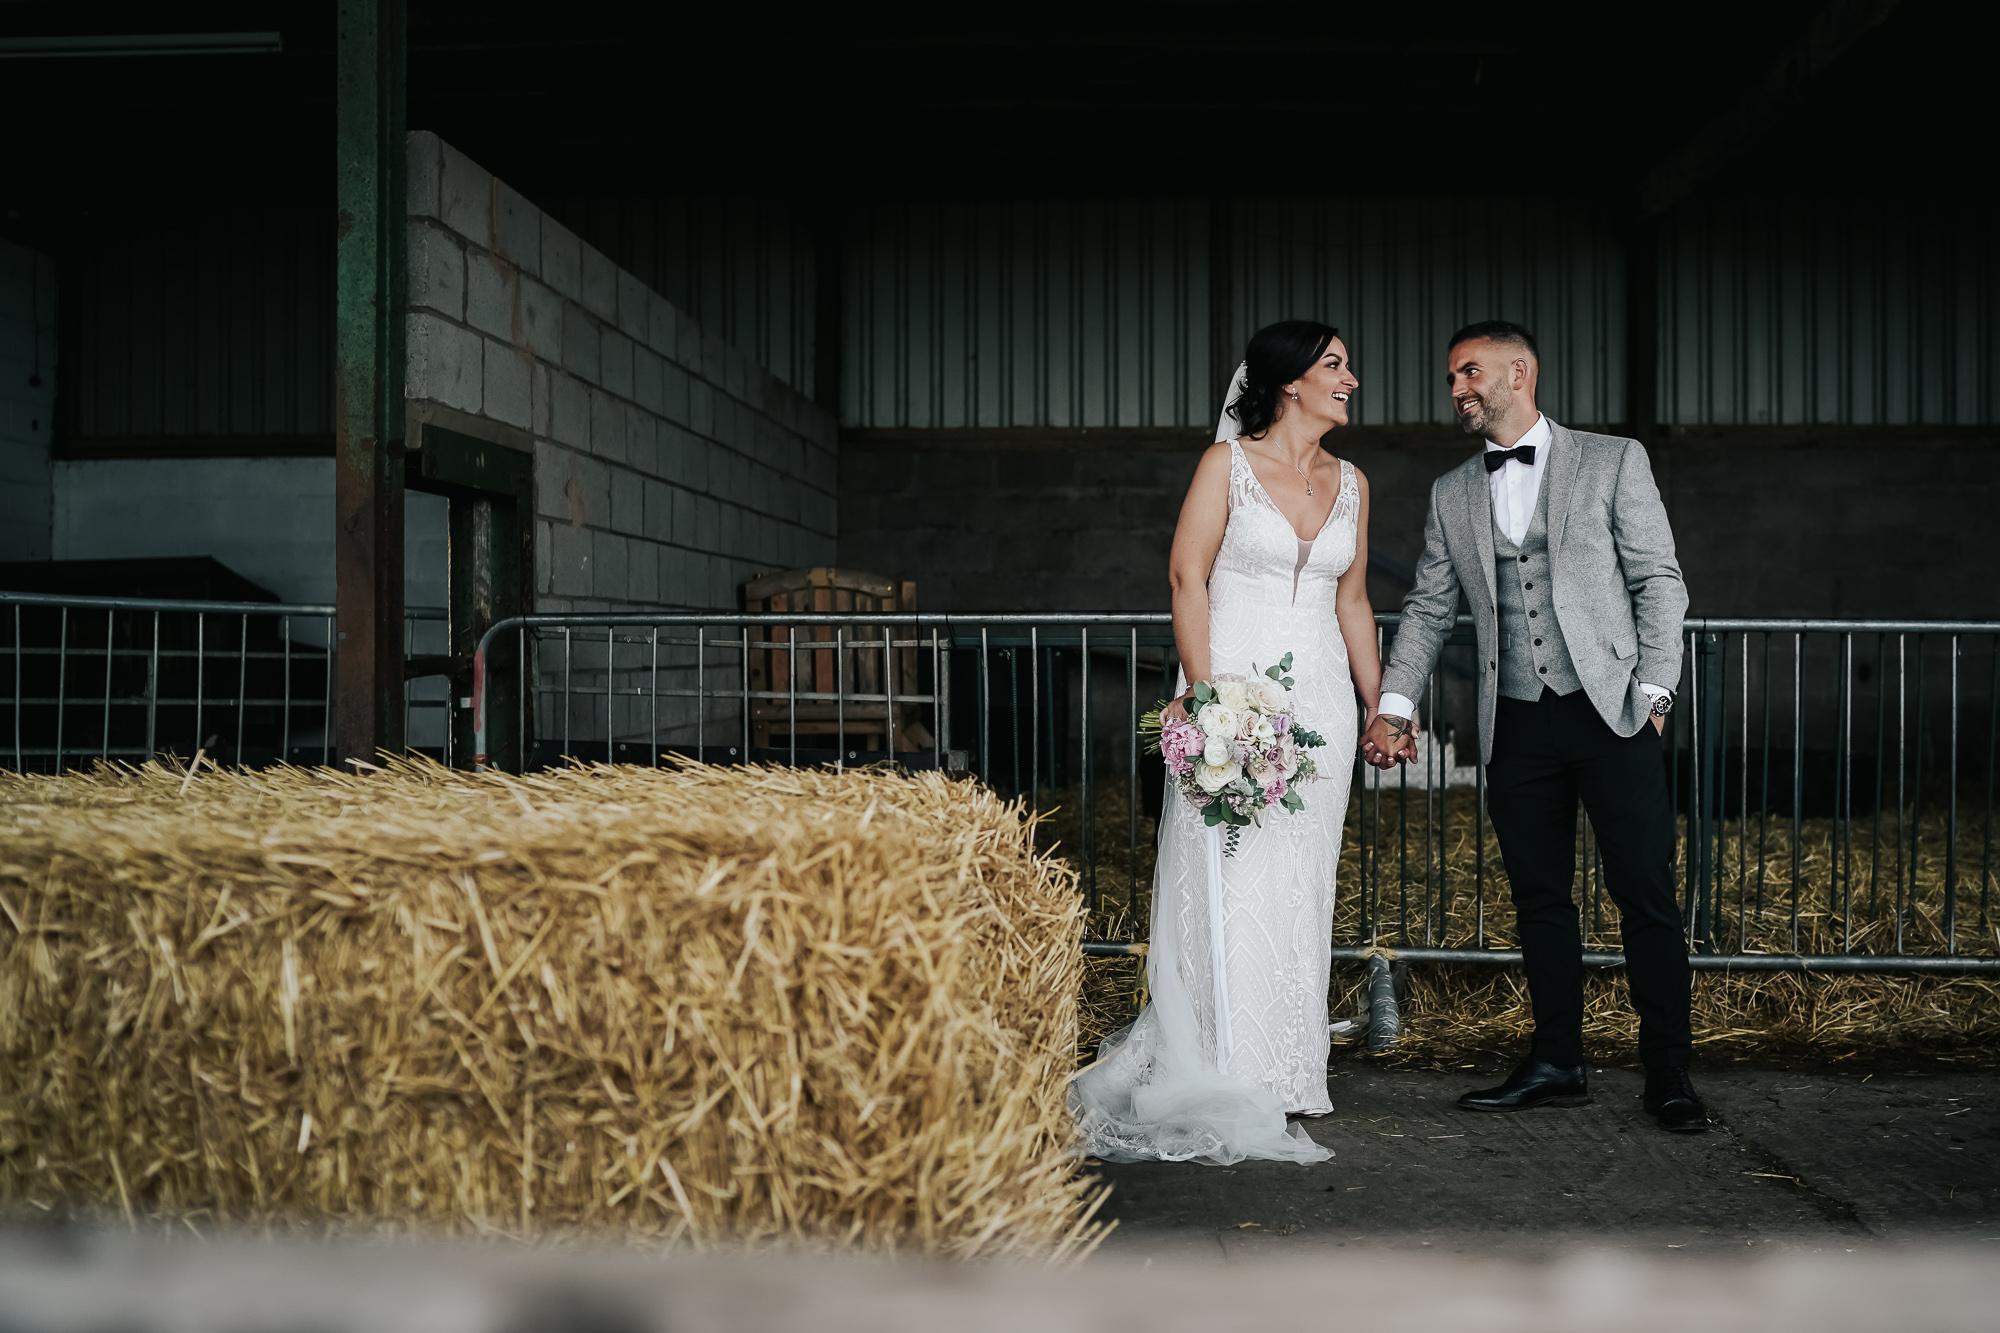 The Hayloft Wedding Photography Cheshire wedding photographer (48 of 52).jpg